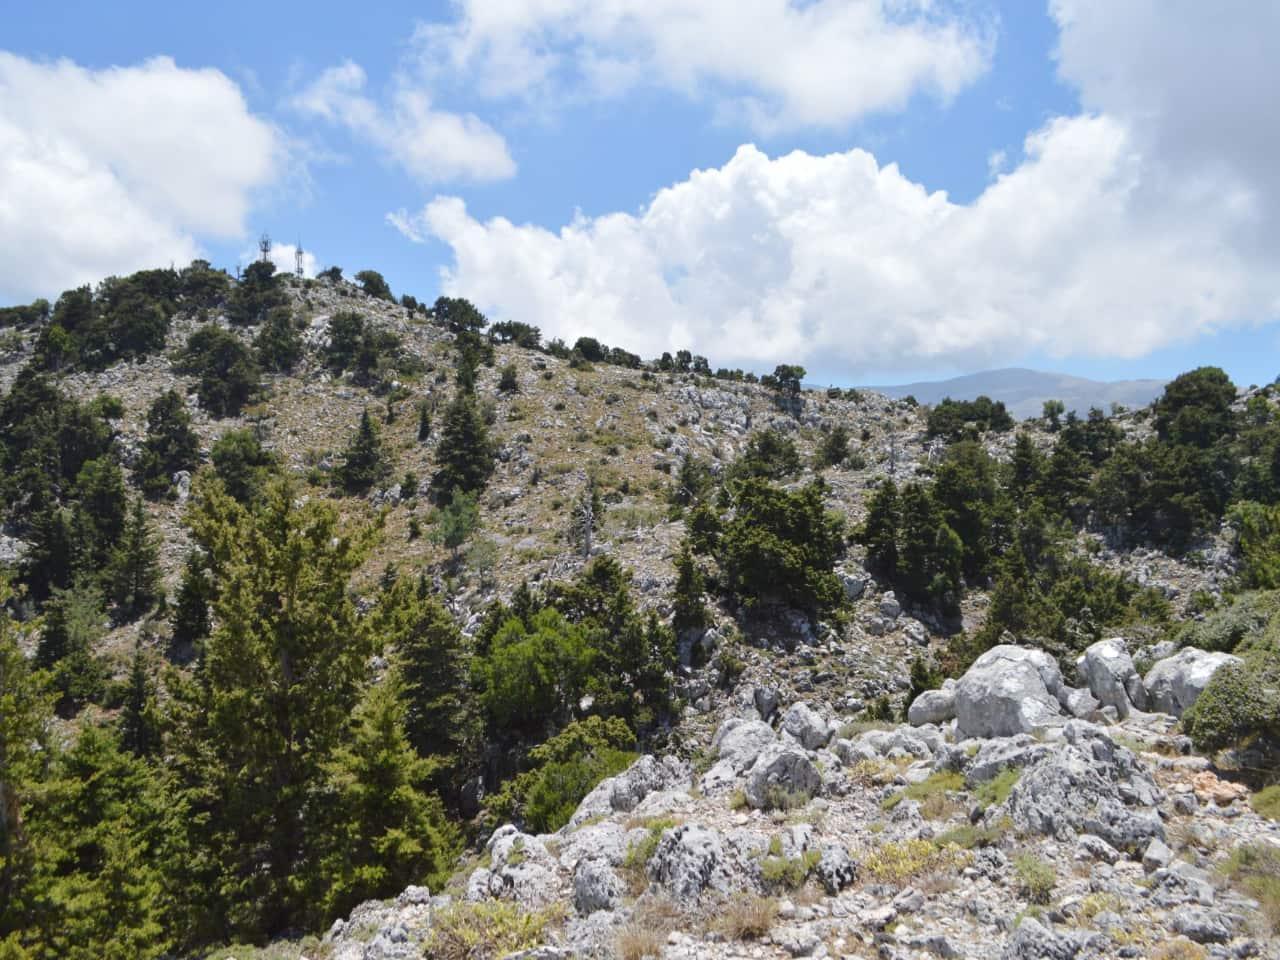 Hiking Trip Omalos Plateau Reikia Hills, activities chania crete, best hiking trip chania, circular hiking trip, easy moderate hiking trip chania, best activities crete, things to do crete, samaria gorge hiking,